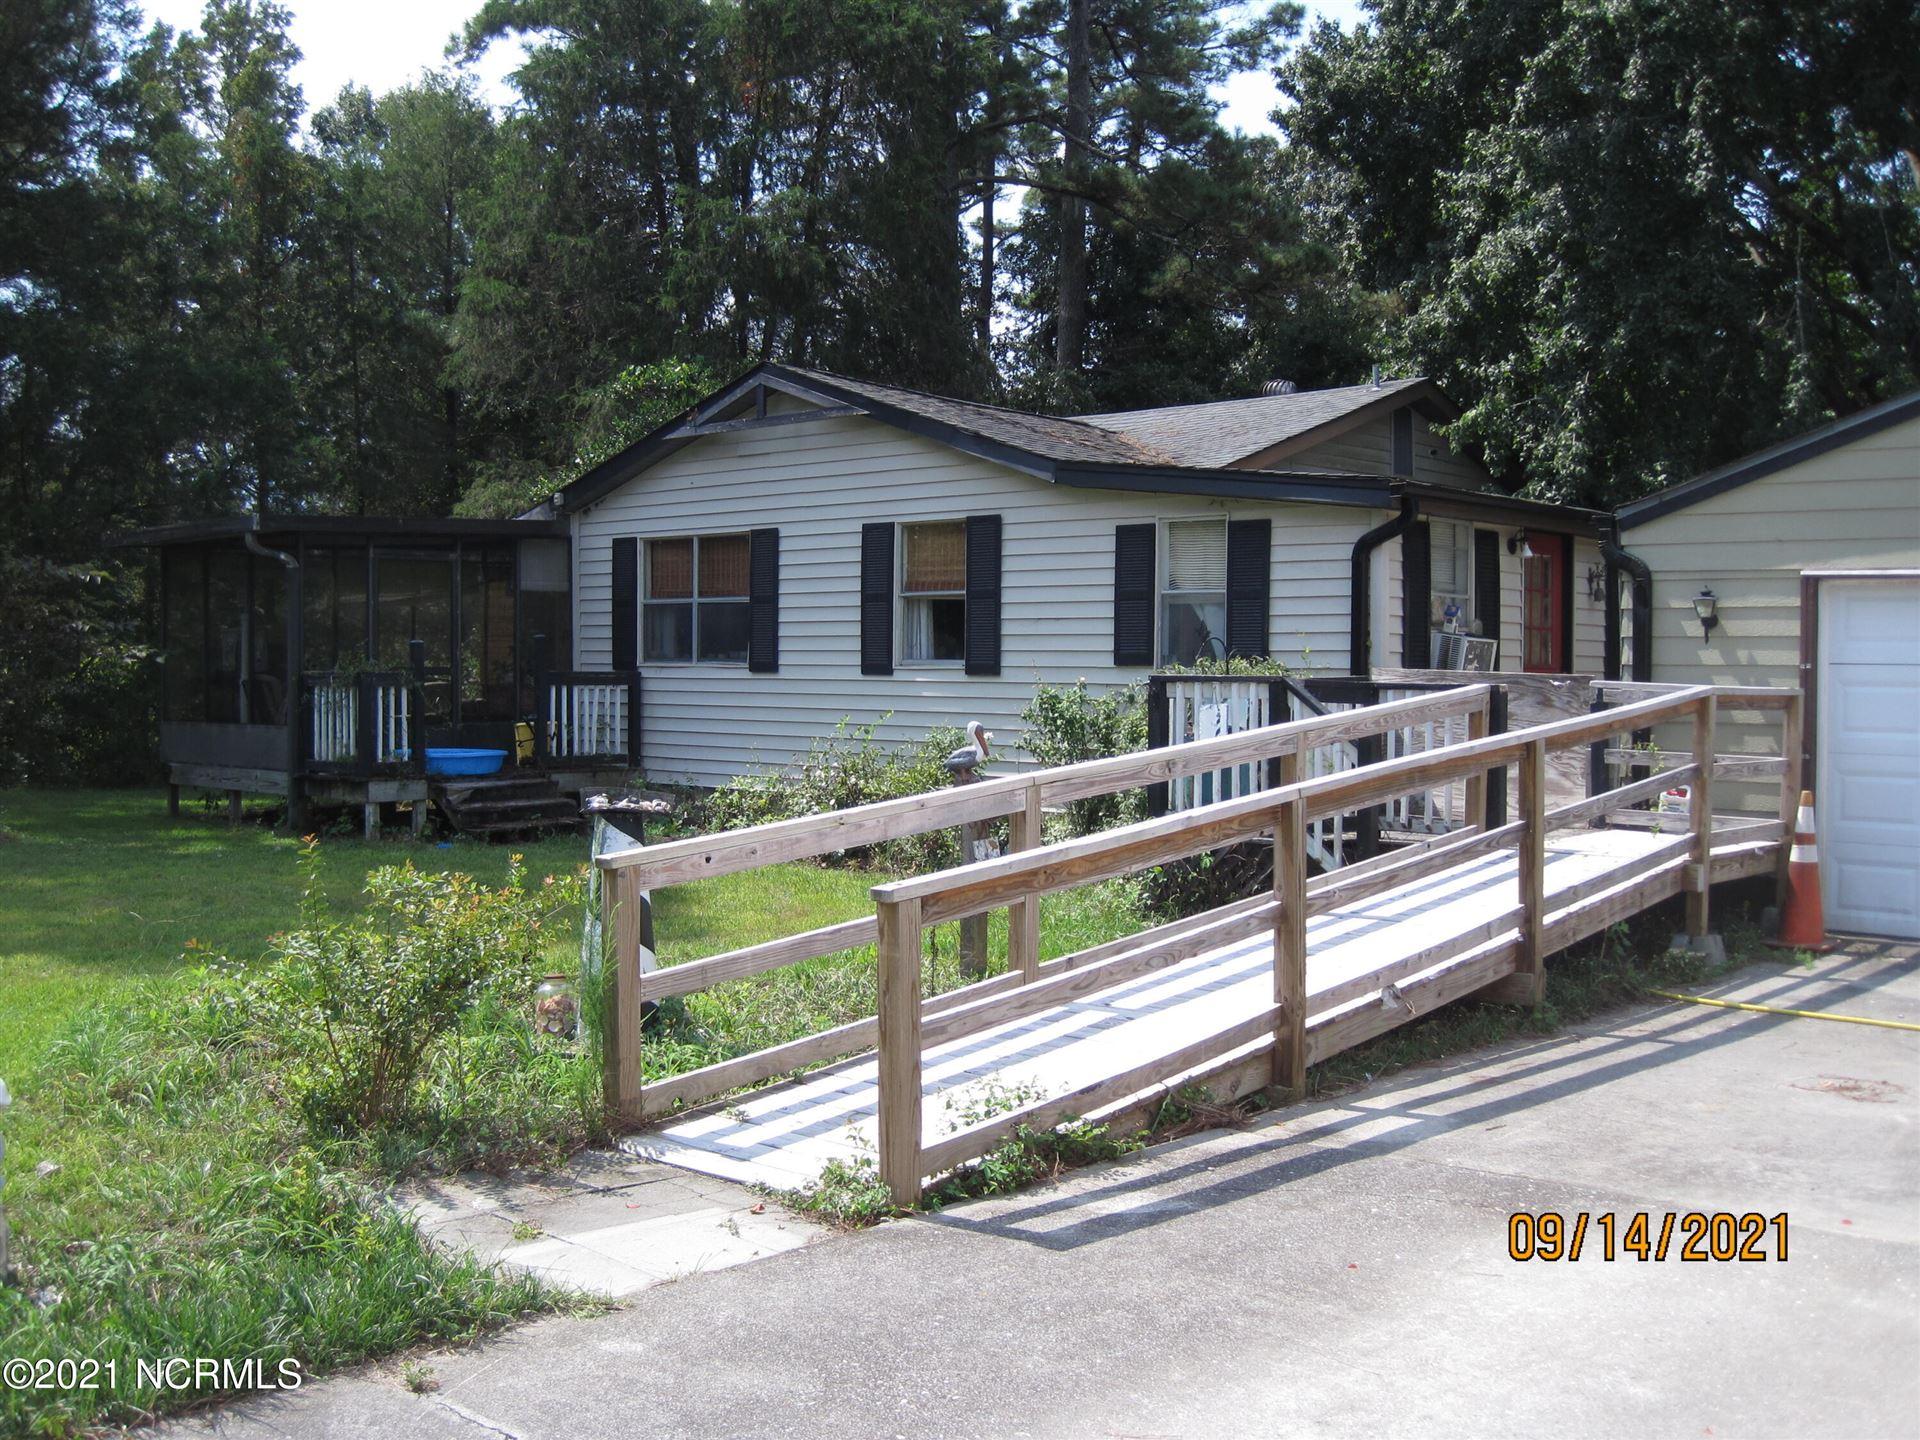 Photo of 190 Old Bridge Road, Rocky Point, NC 28457 (MLS # 100290736)